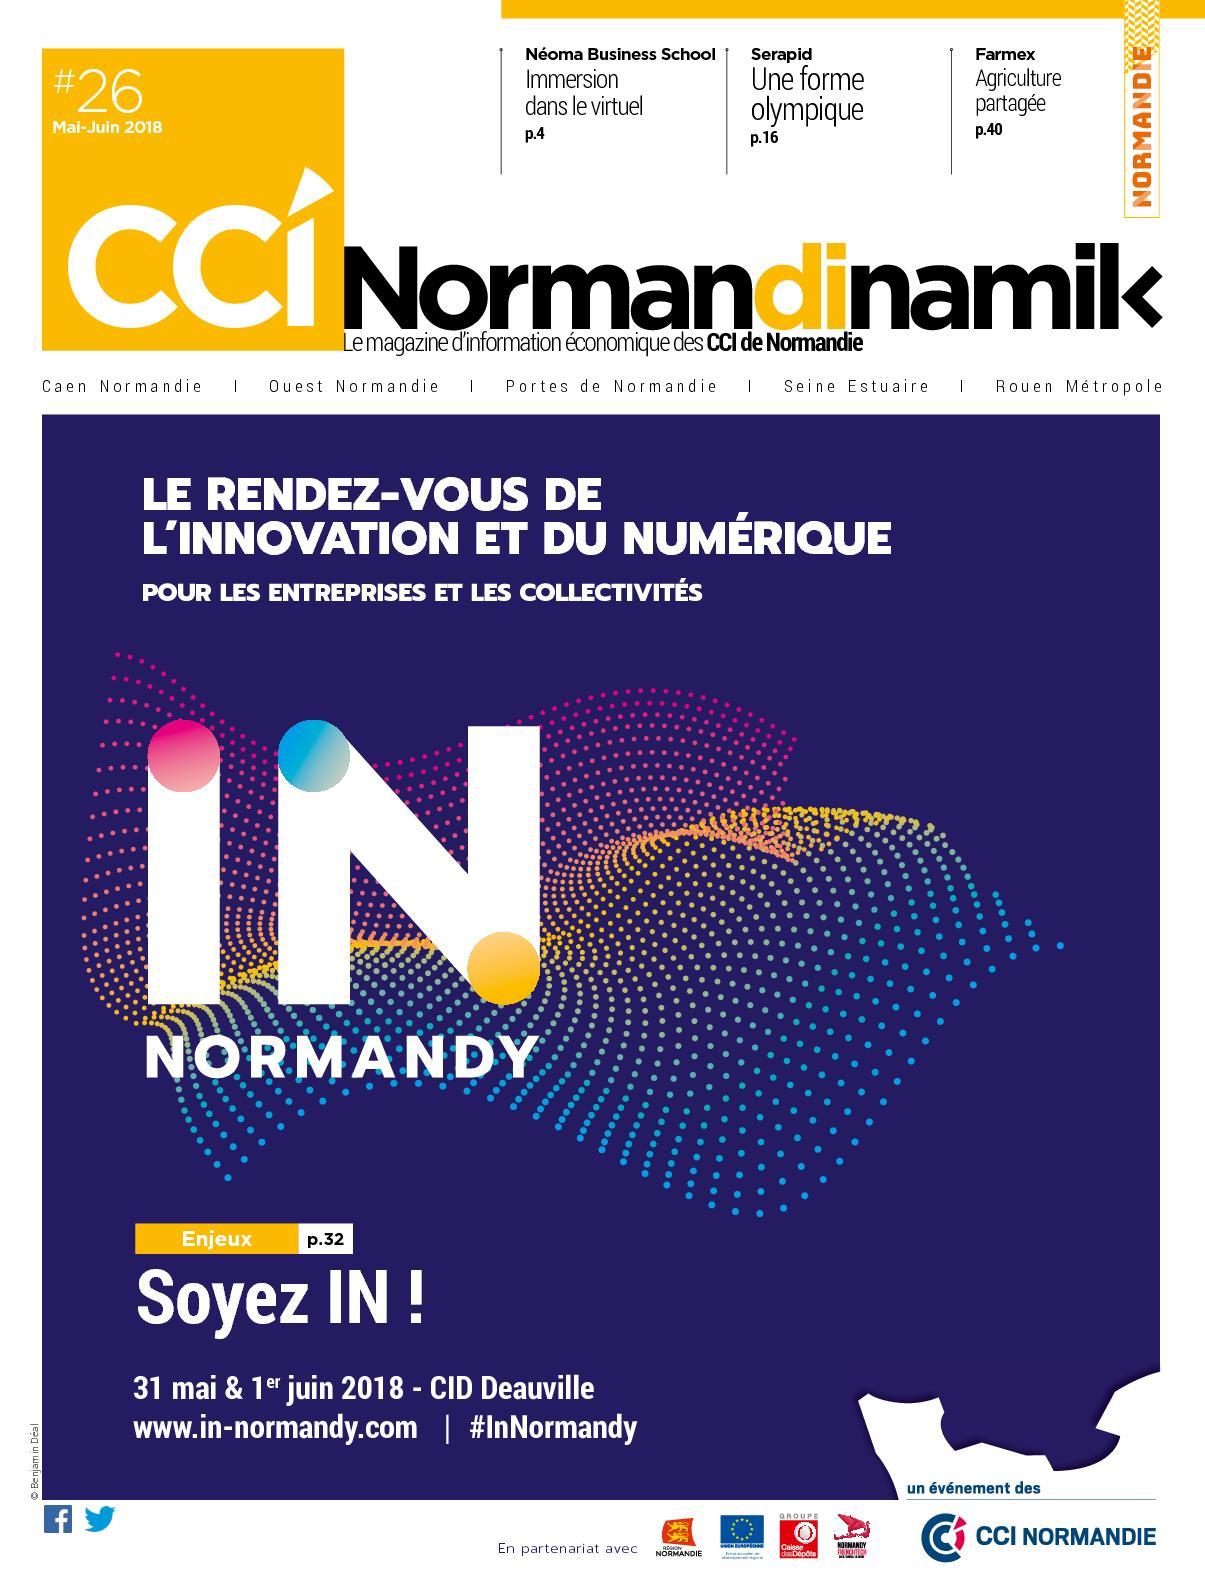 c7e7c8e41a71 Calaméo - Normandinamik  26 Mai-Juin 2018